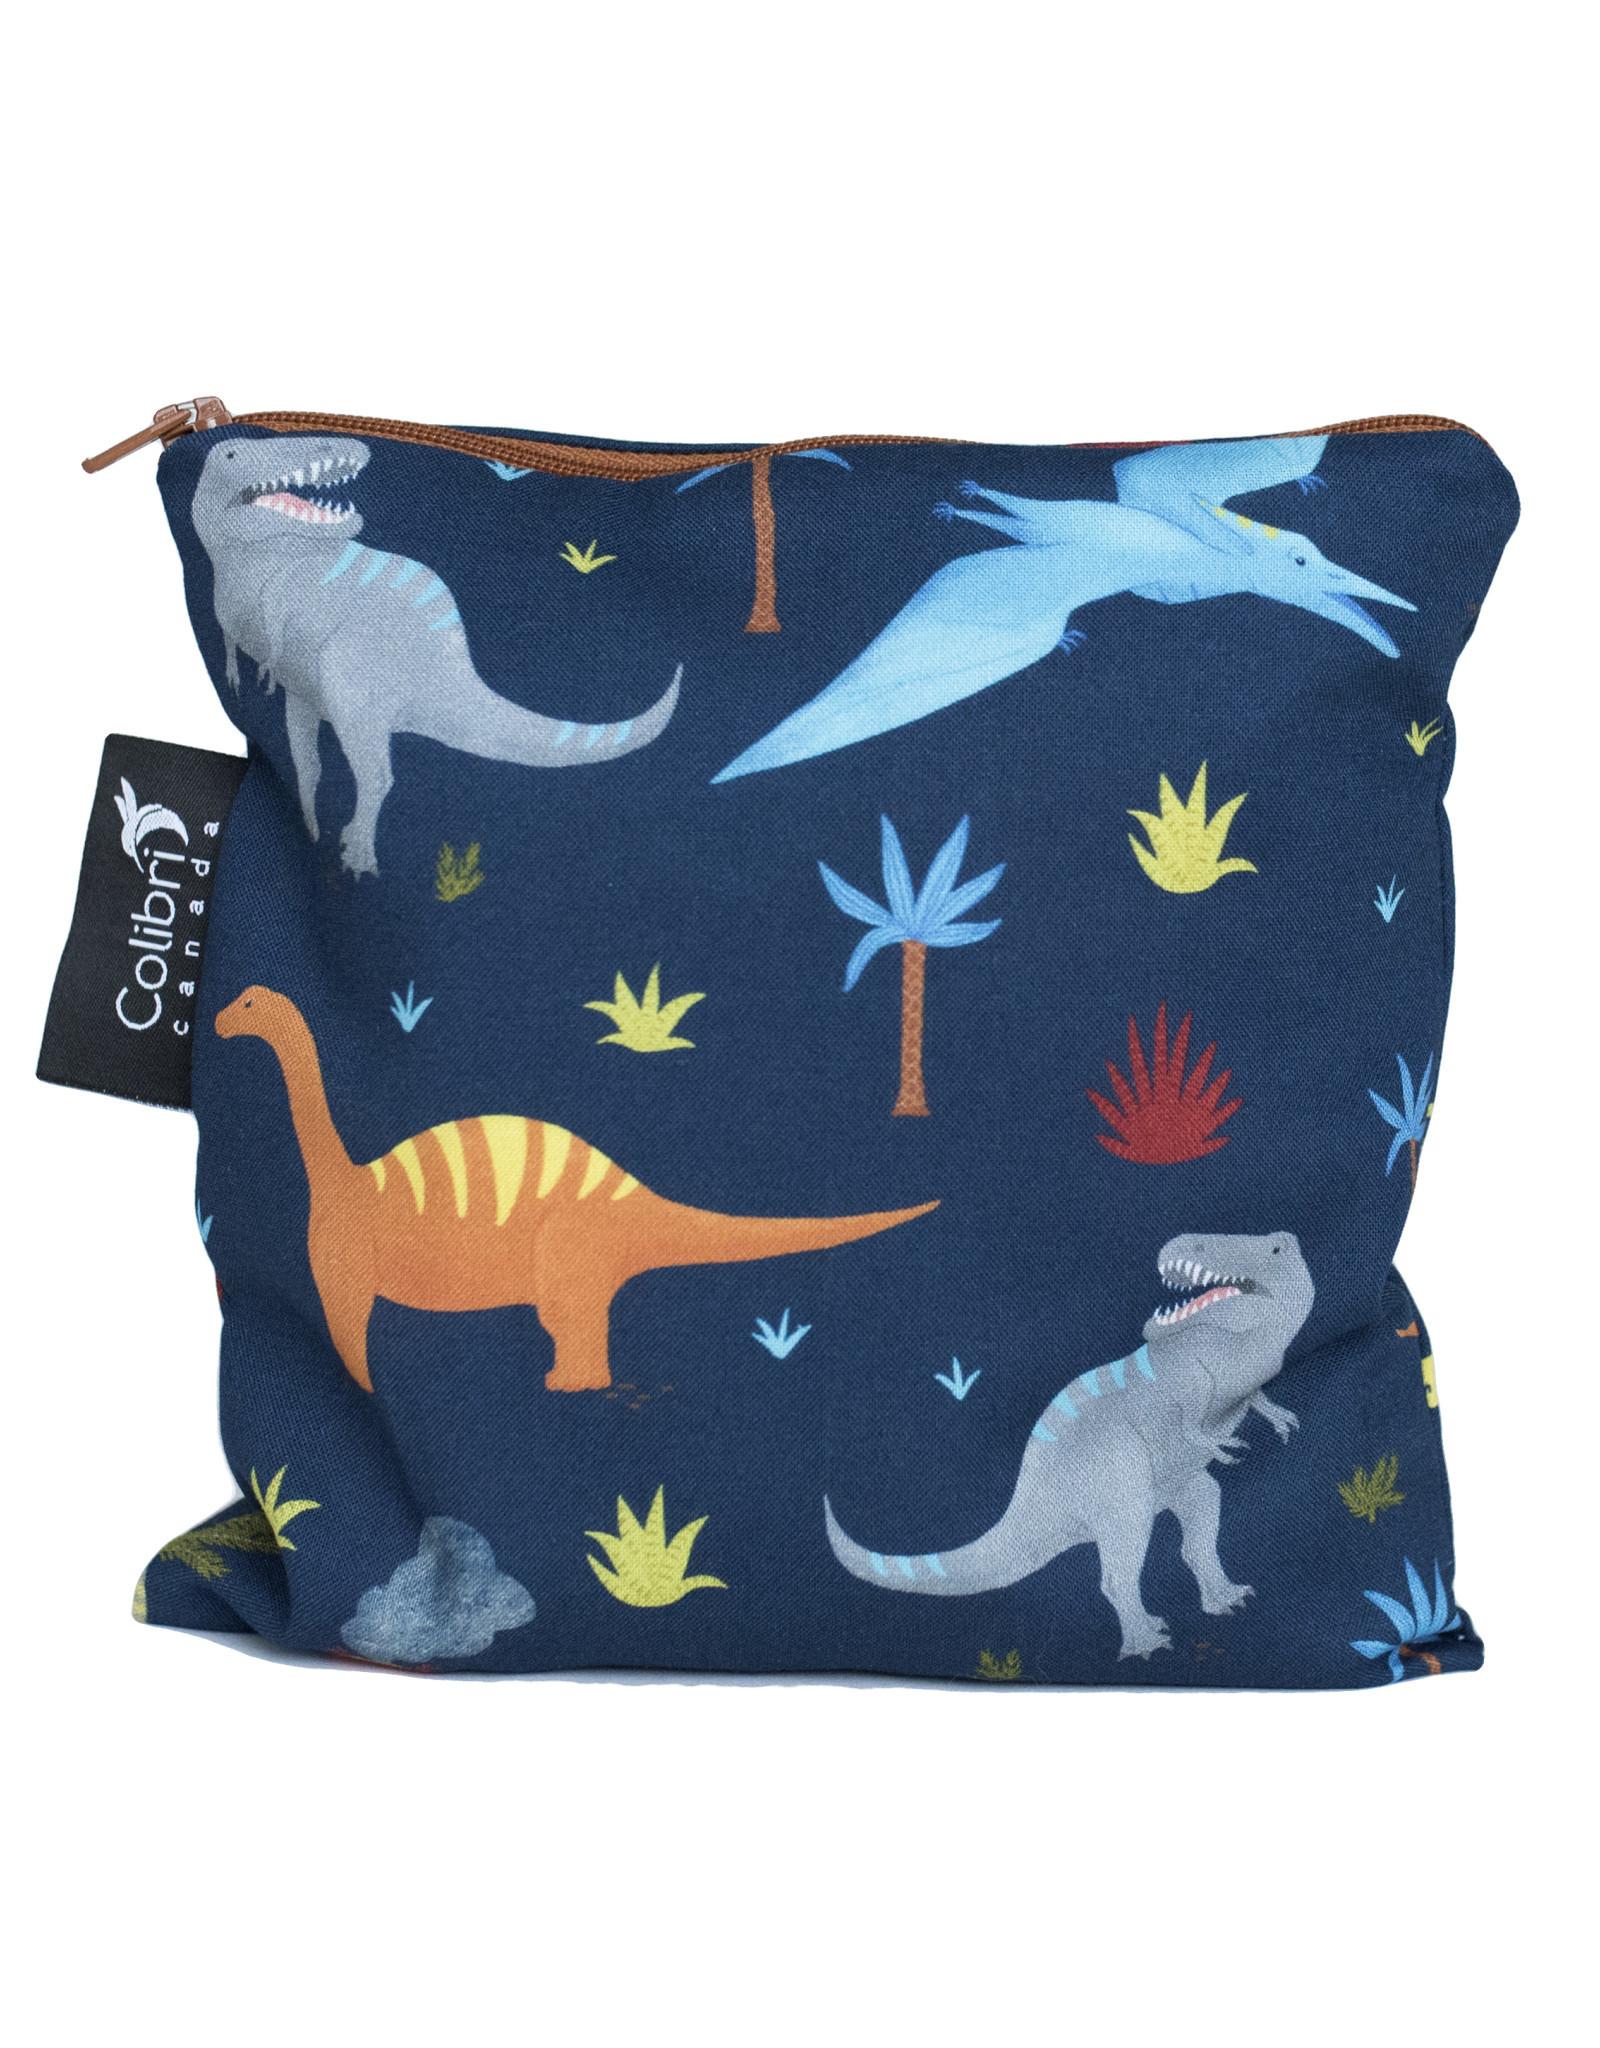 Colibri Canada Reusable Snack Bag - Large